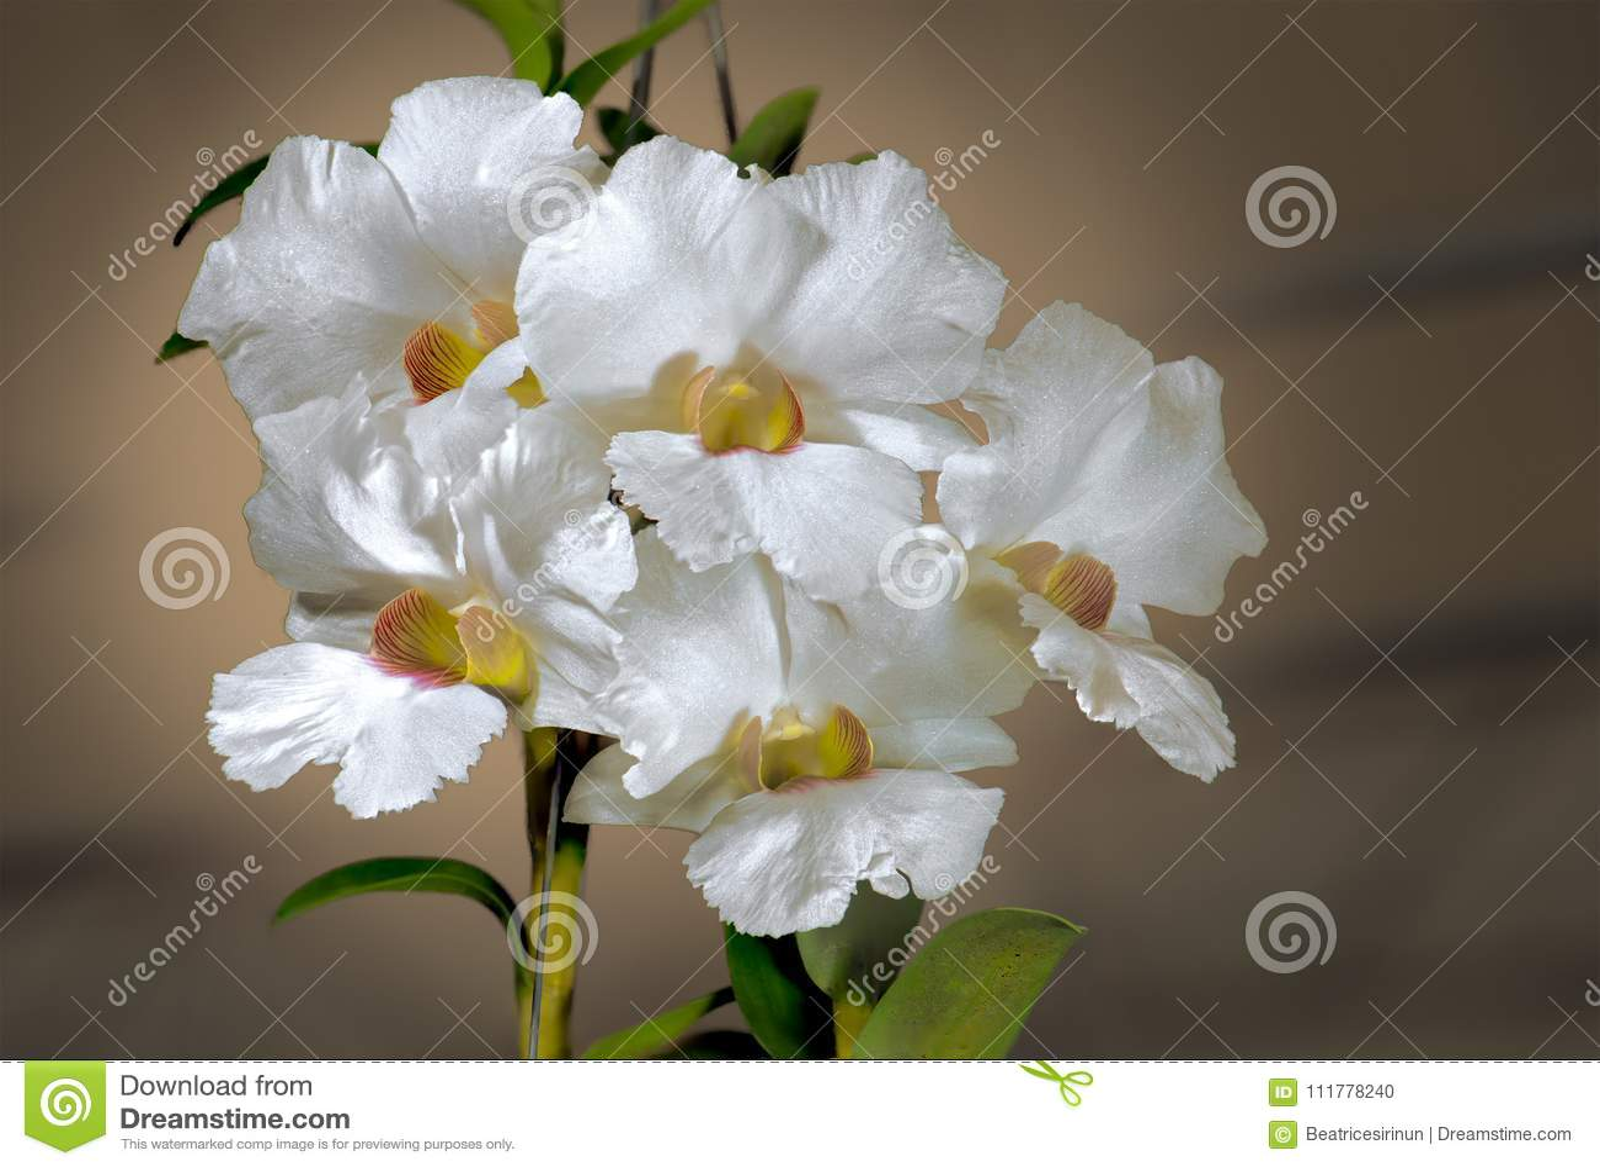 WHITE CATTLEYA HYBRID ORCHID.